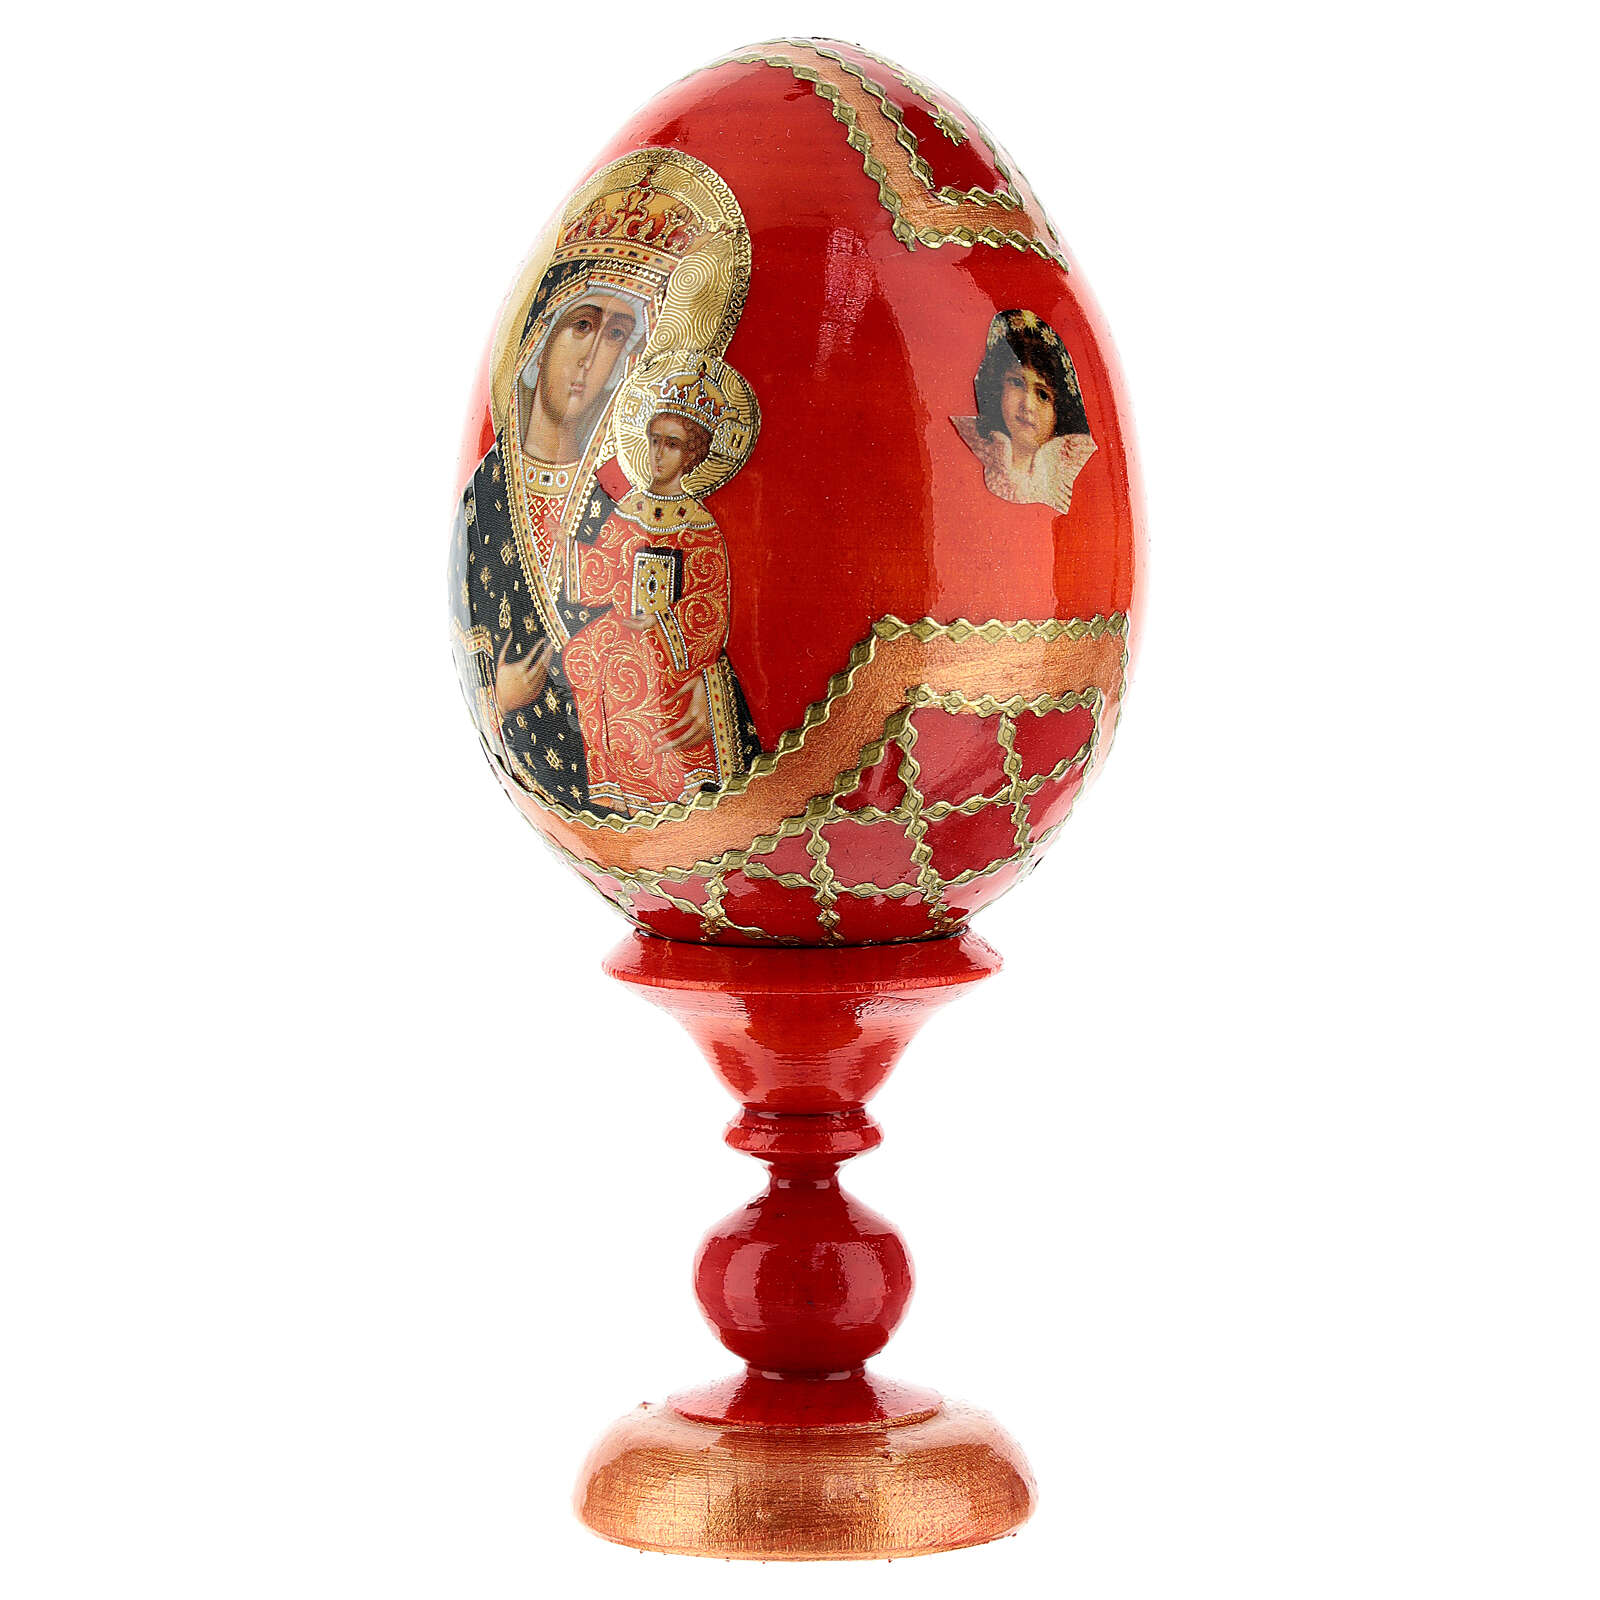 Uovo icona decoupage Russia Chenstohovskaya h tot. 13 cm stile Fabergé 4